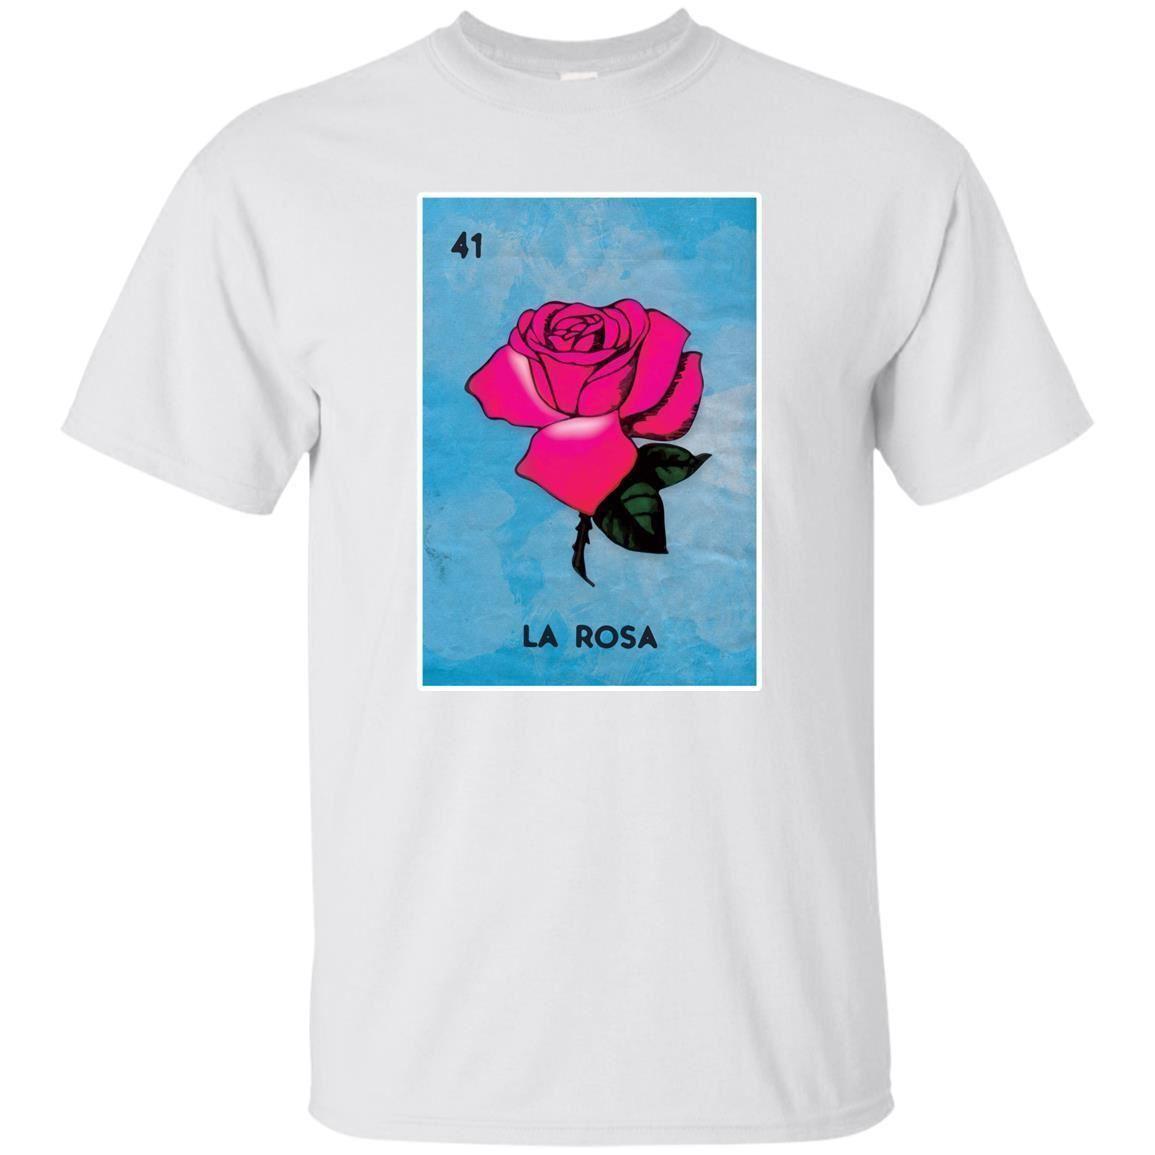 ac918ba0ab Mexican Loteria Tshirts - La Rosa Black Navy T Shirt Grunge Version Full  Size Round Style top free shipping tshirt